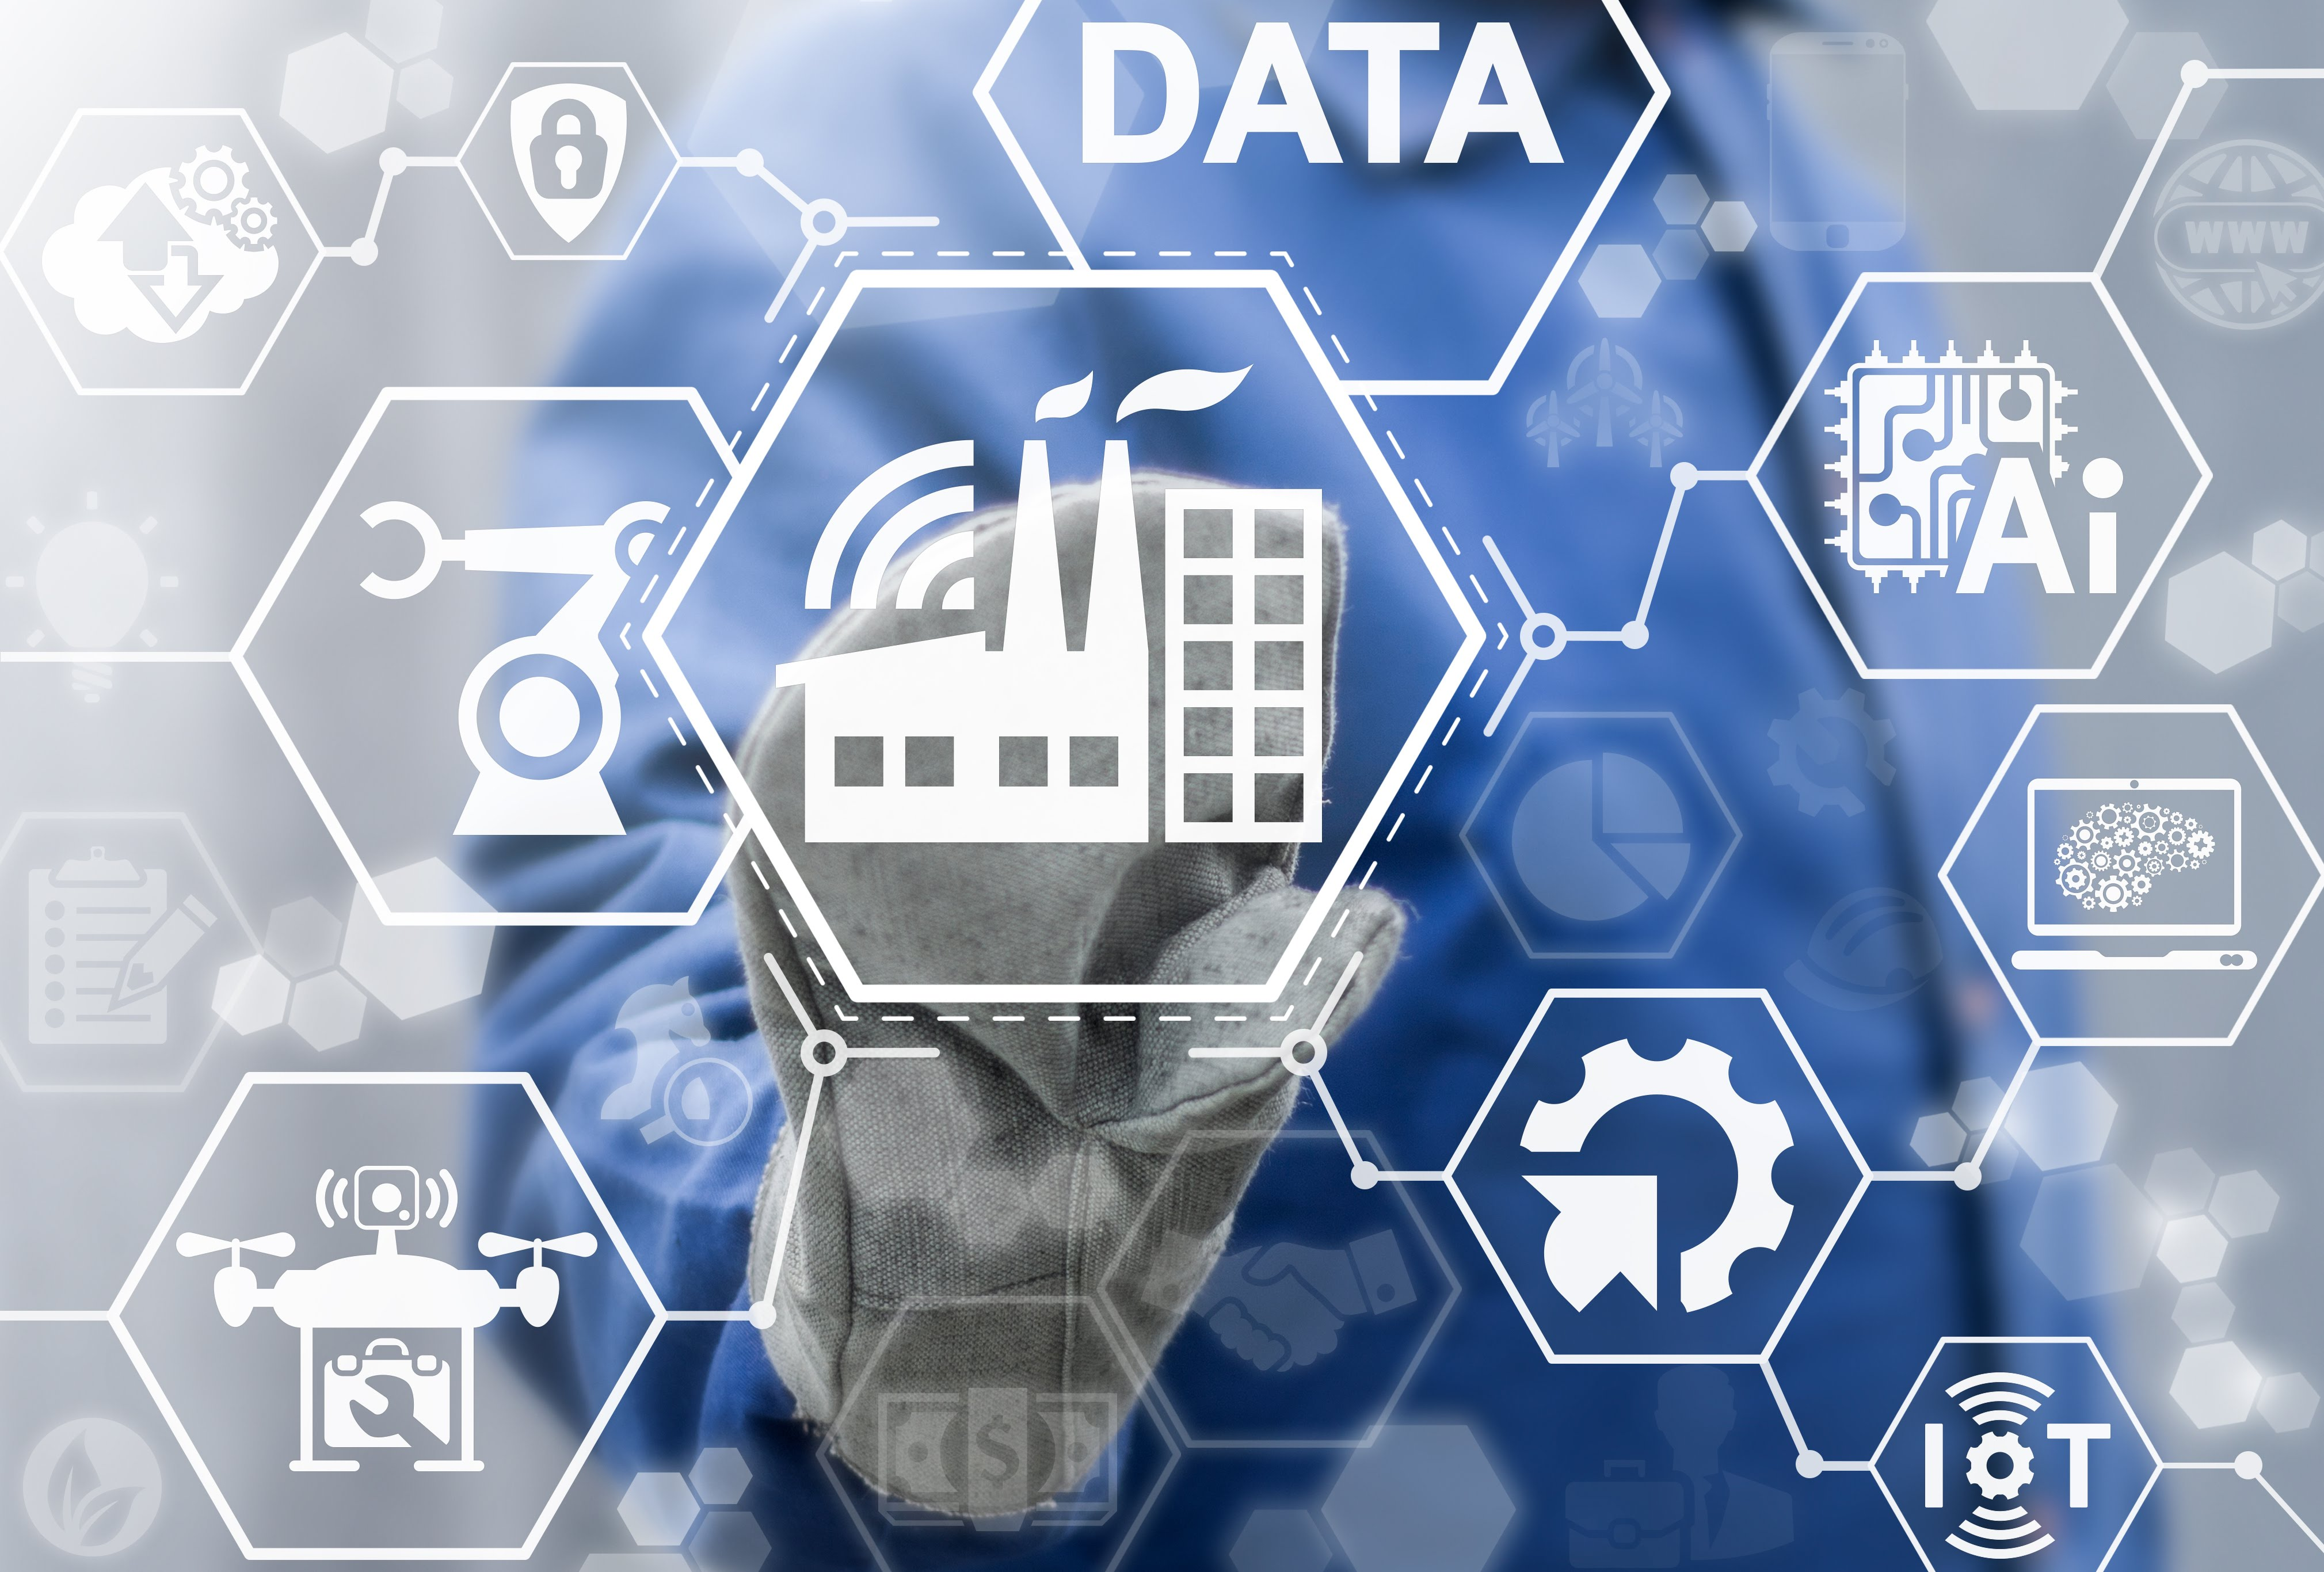 https://www.nist.gov/oam/creating-consortium-advanced-hybrid-manufacturing-integrating-technologies